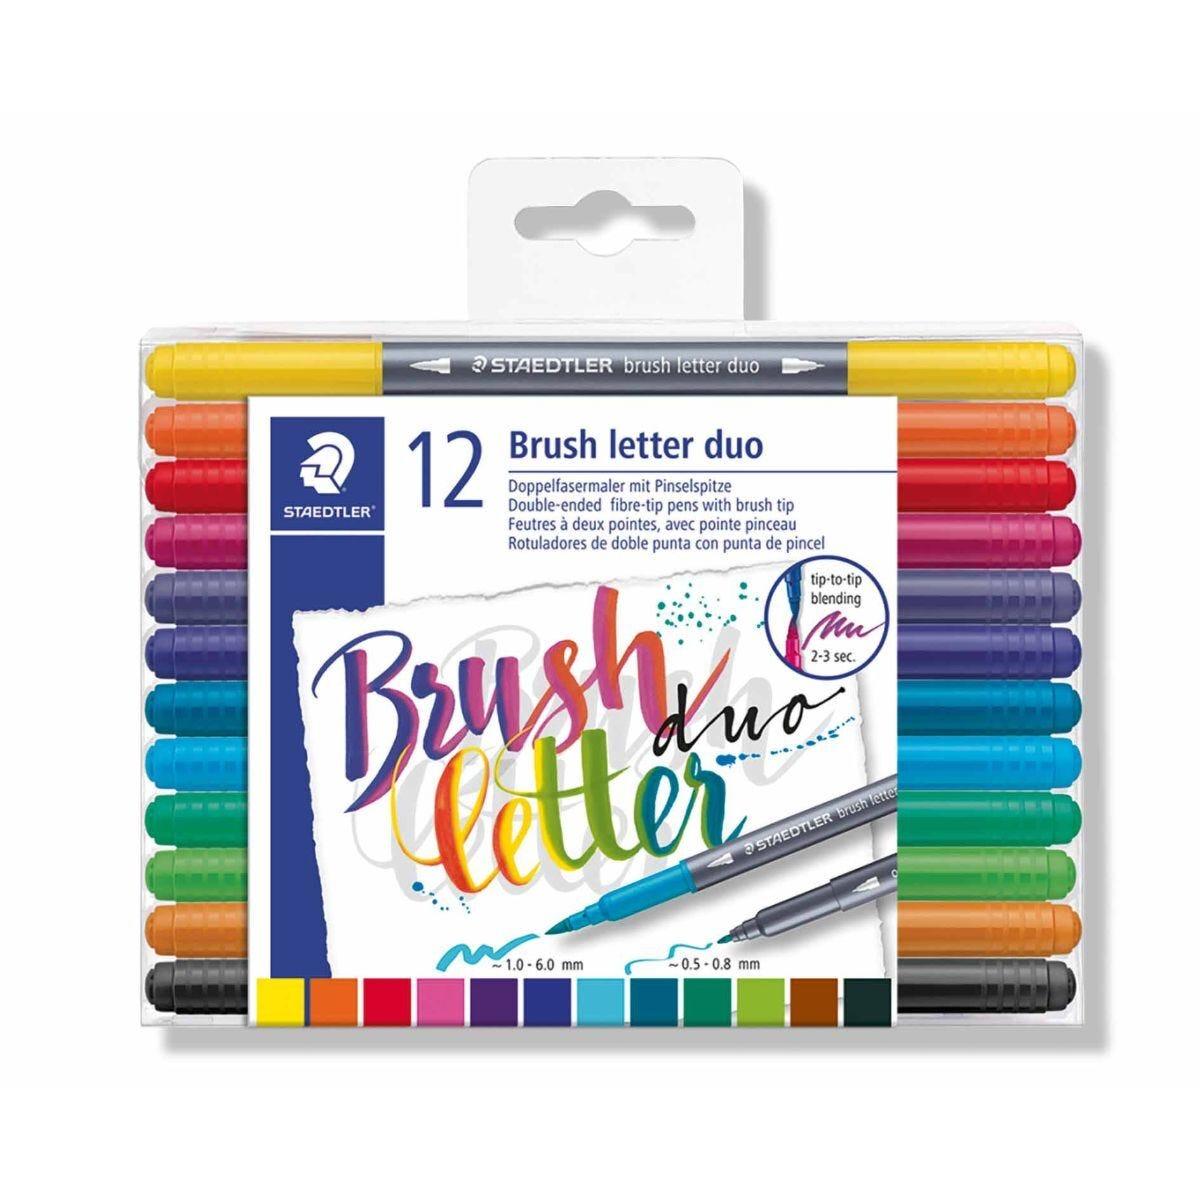 Staedtler Brush Lettering Duo Tip Pens Pack of 12